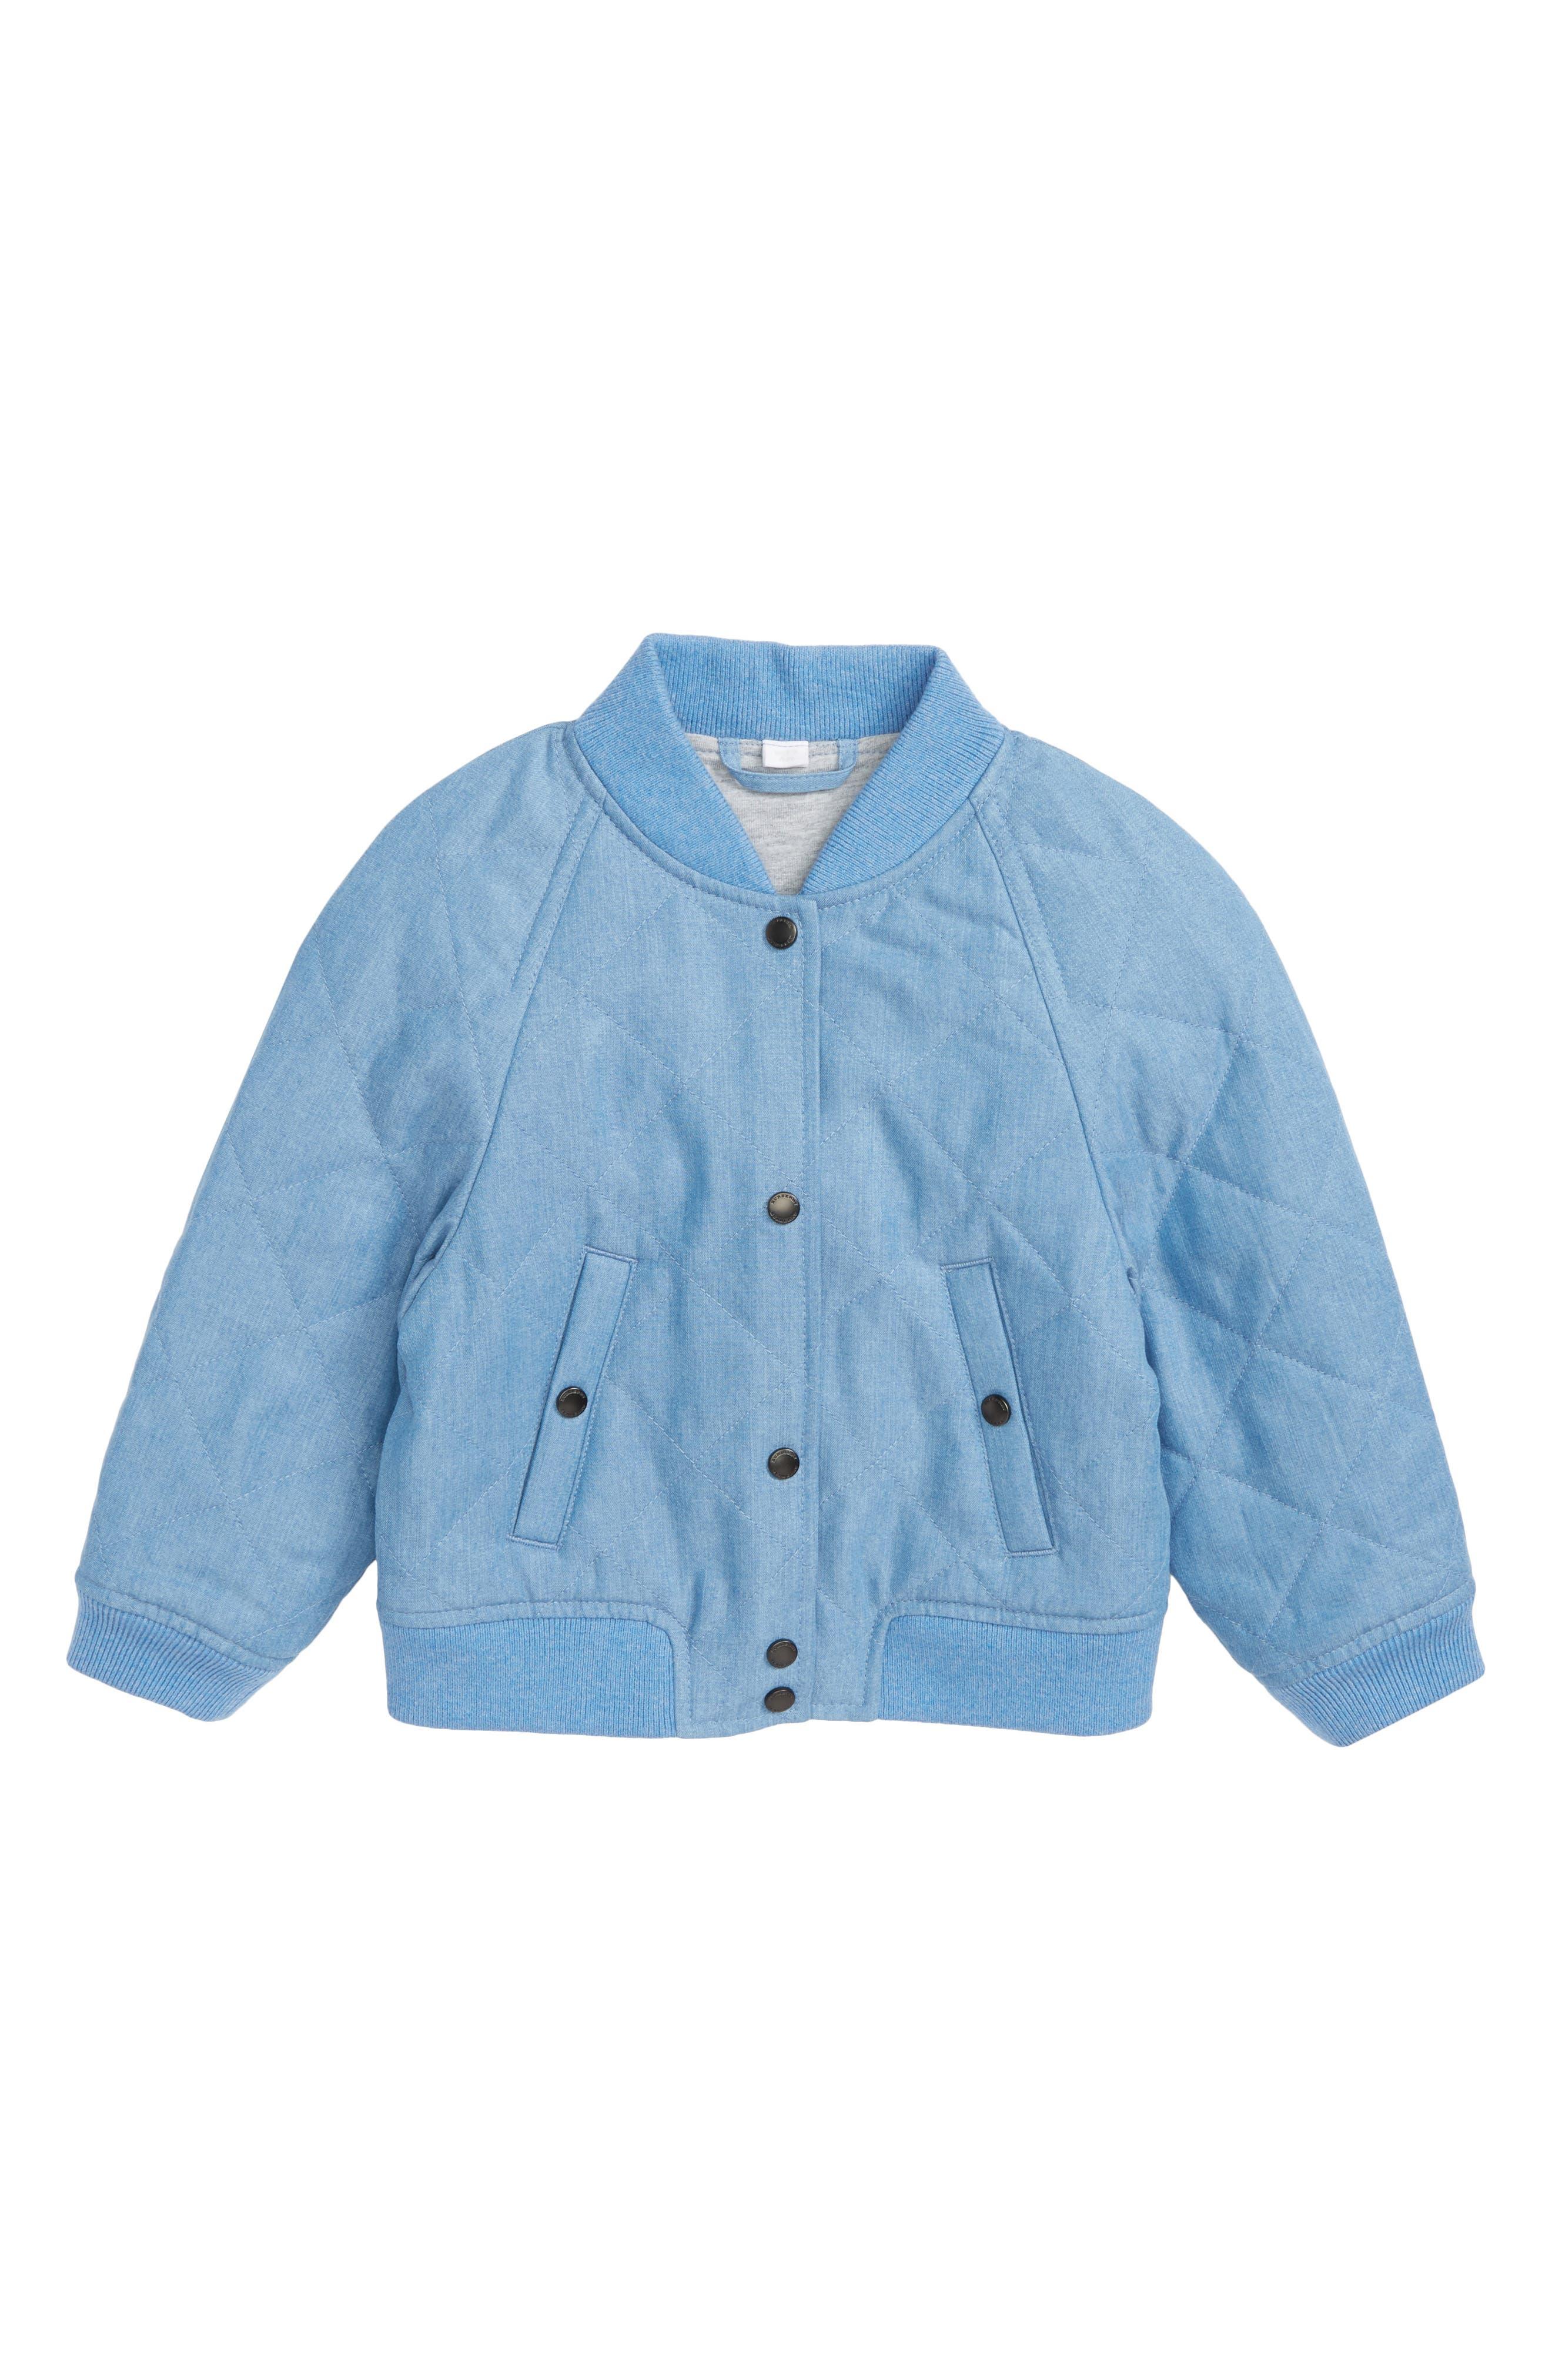 Joelle Quilted Denim Bomber Jacket,                             Main thumbnail 1, color,                             Steel Blue